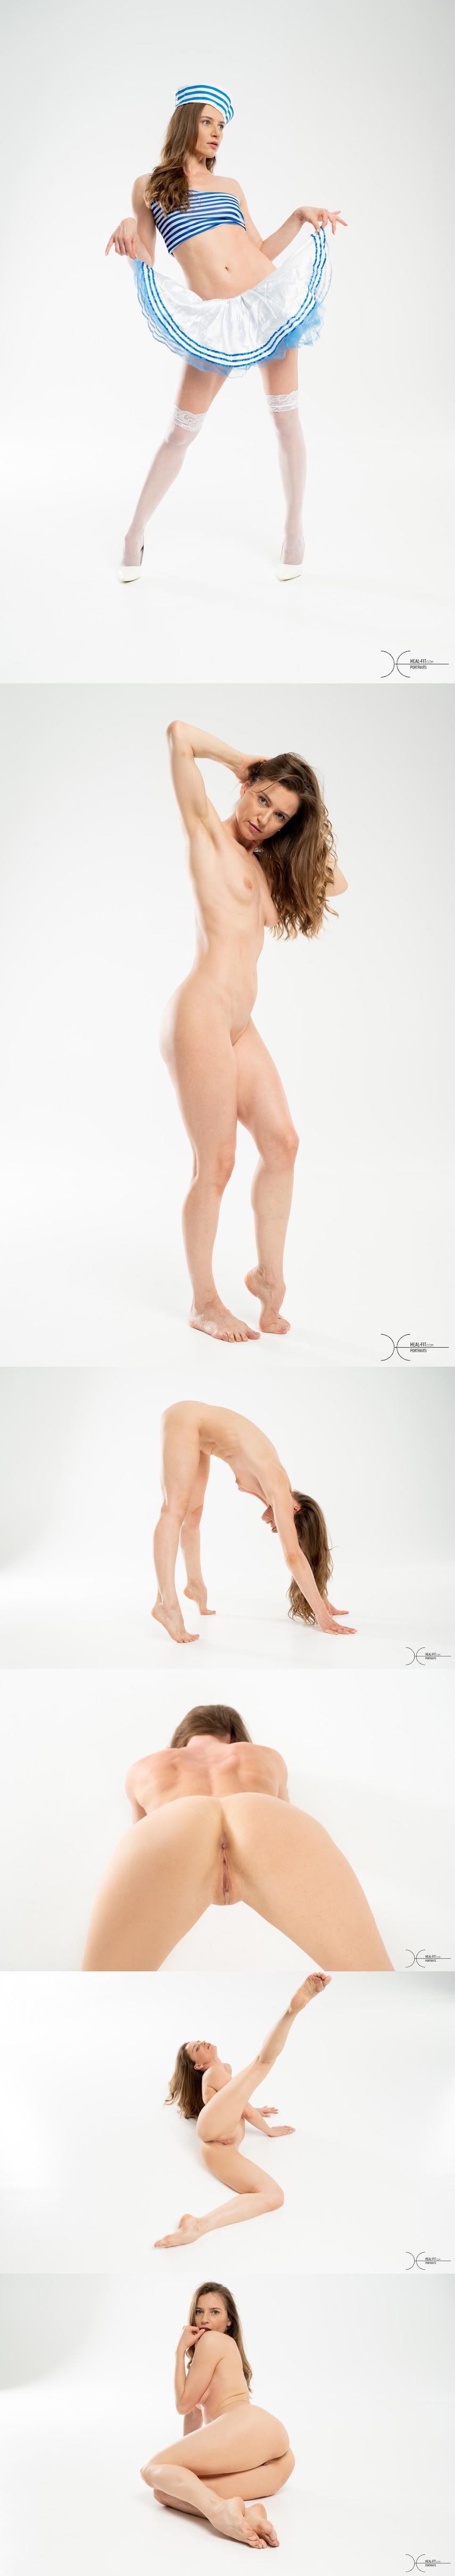 [Heal-Fit] Milana - Sailor sexy girls image jav